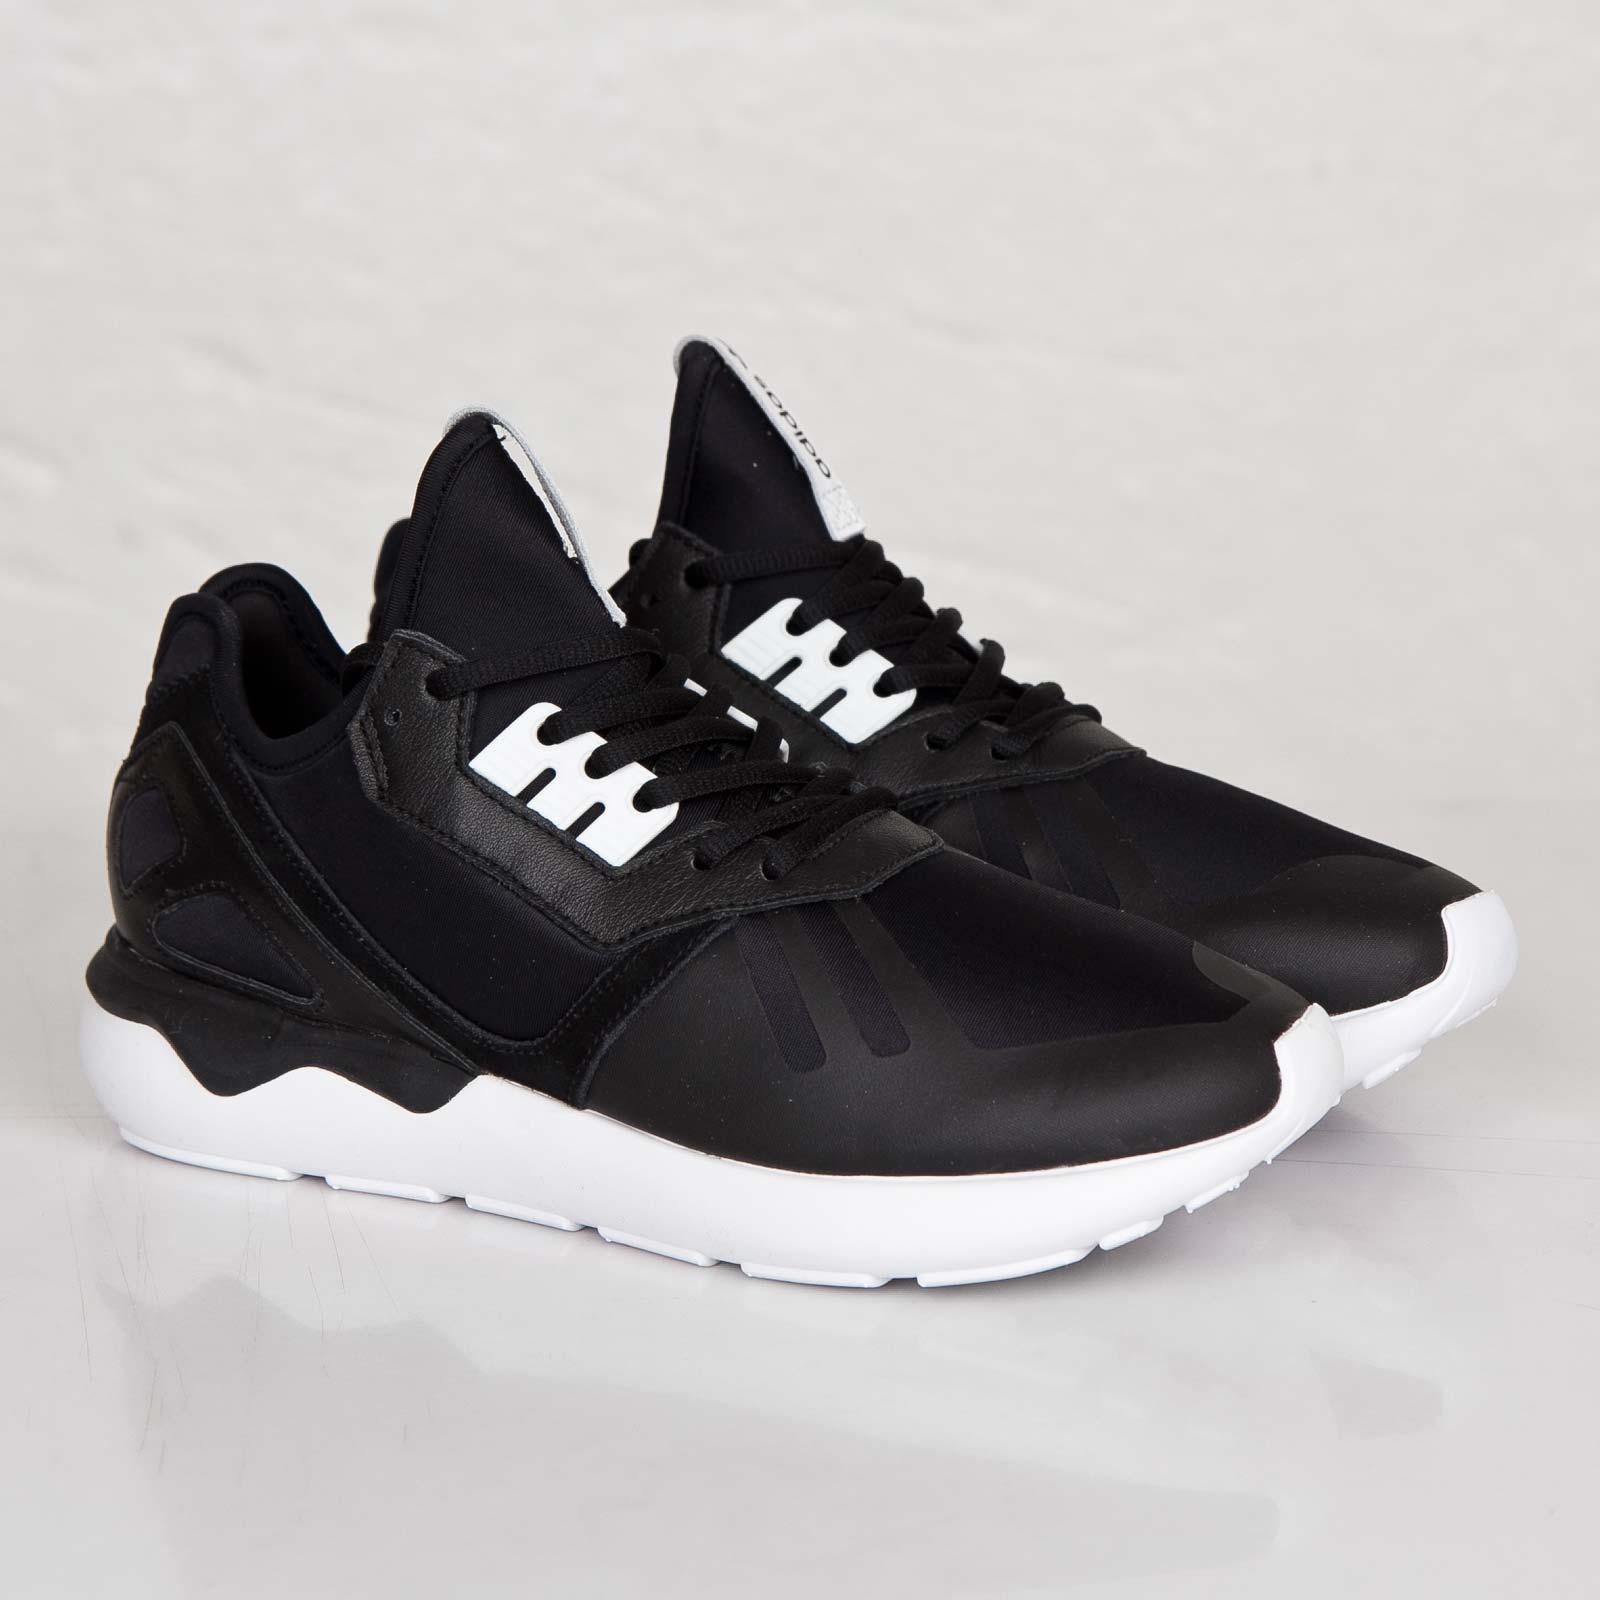 49840a1e28ab73 adidas Tubular Runner - B41272 - Sneakersnstuff